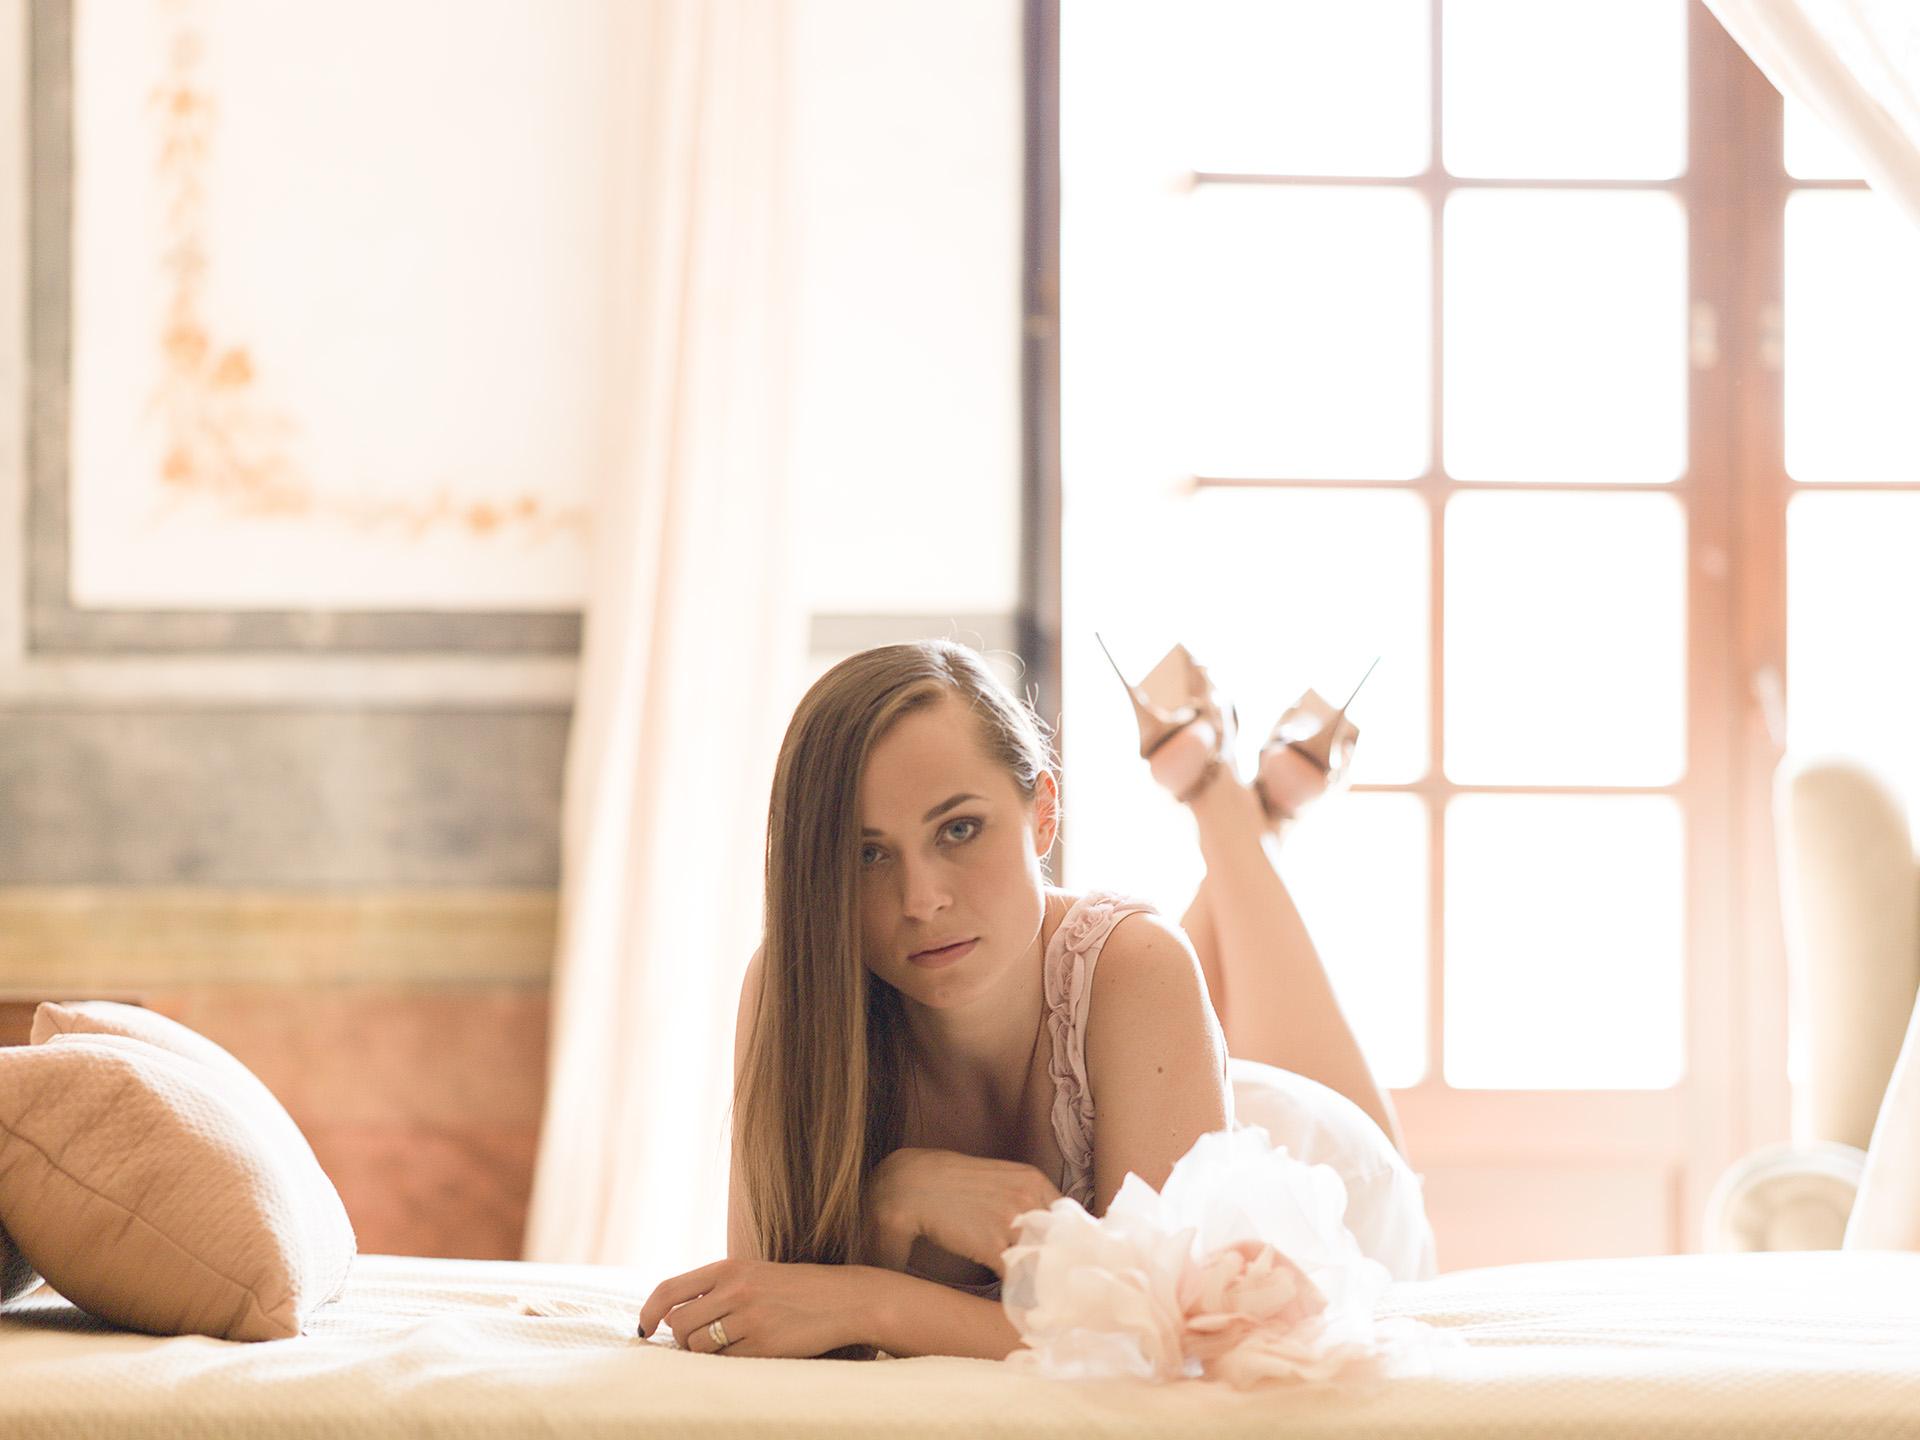 MONASTERIO de RUEDA. Model: Olga Grebenikova Bild Eric Berger